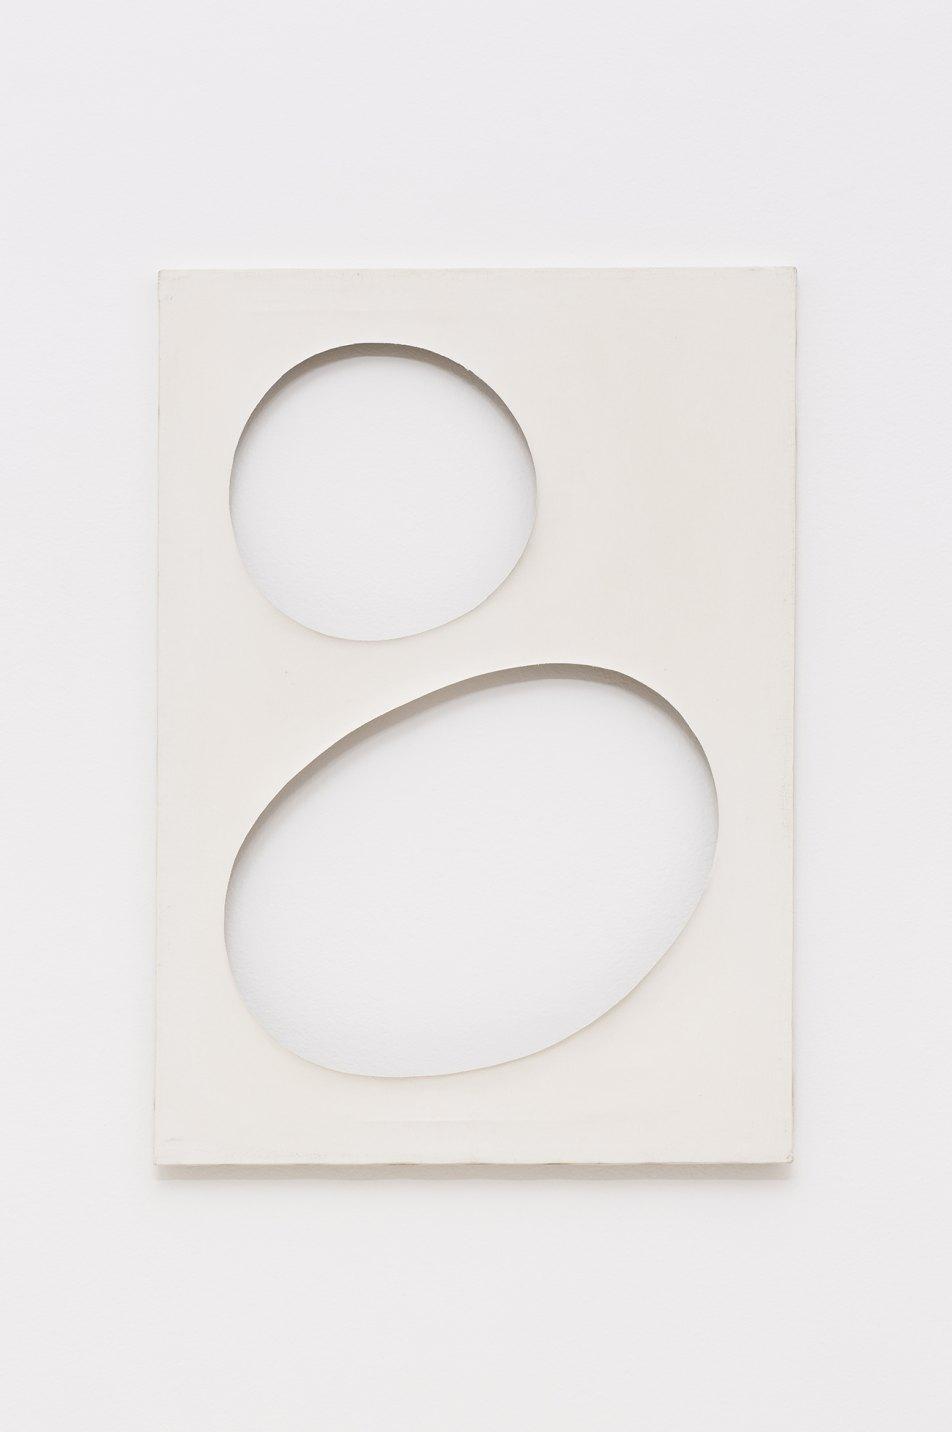 Dadamaino, <em>Volume 109/14,</em> 1958, water-based paint on canvas, 70 × 50 cm - Mendes Wood DM